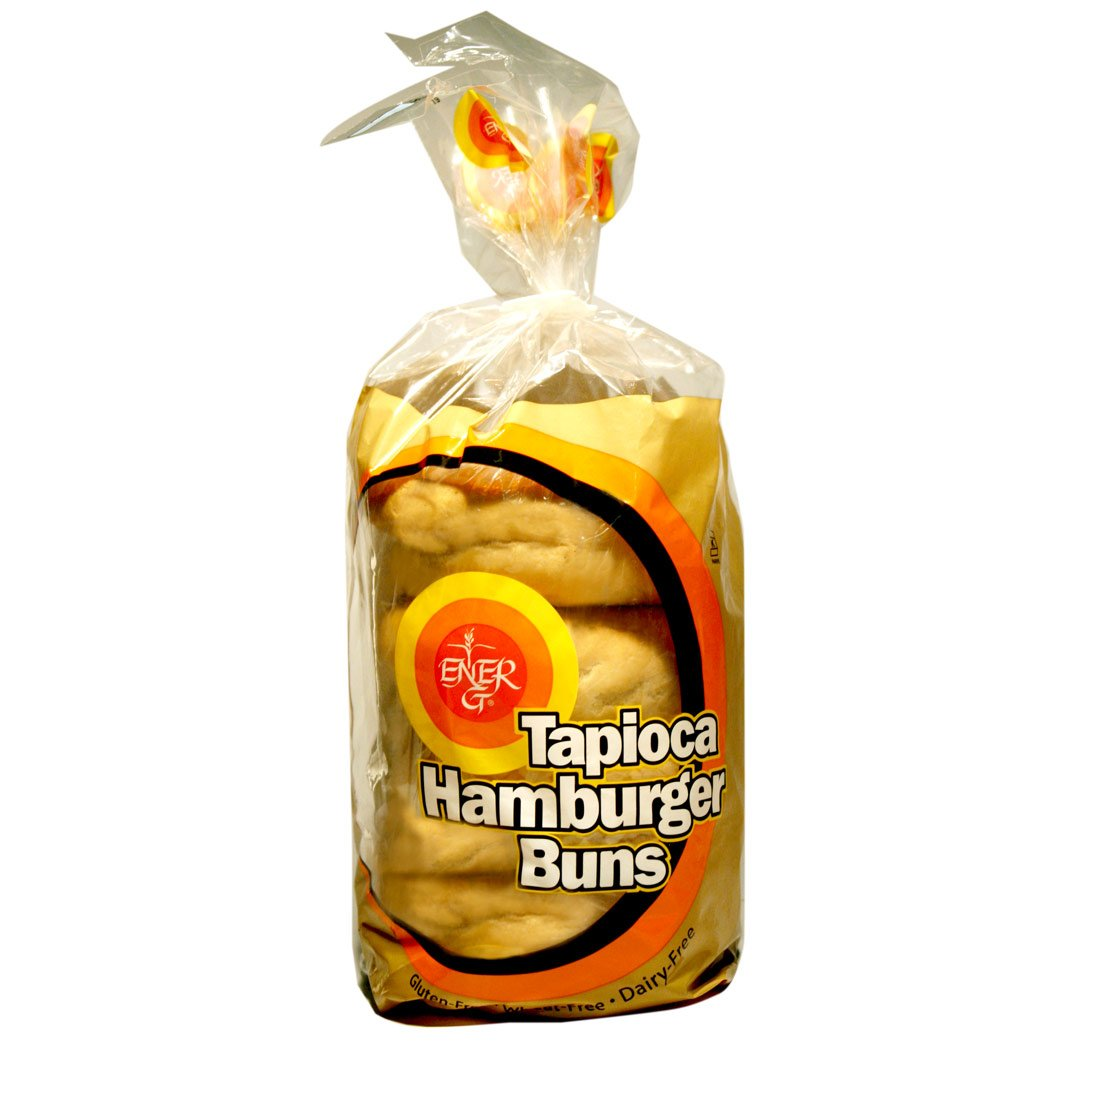 Ener-G Foods Tapioca Hamburger Buns, 7.76-Ounce Units (Pack of 6)